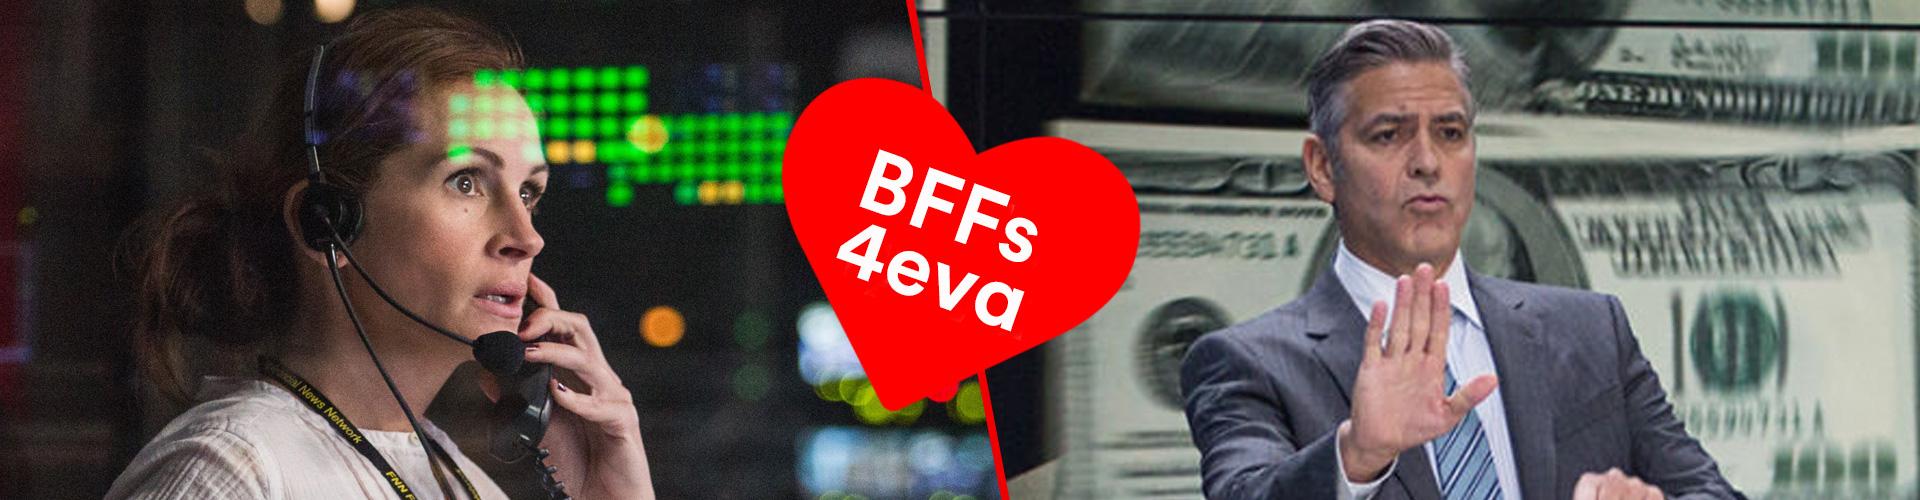 celeb-BFFs-header.jpg